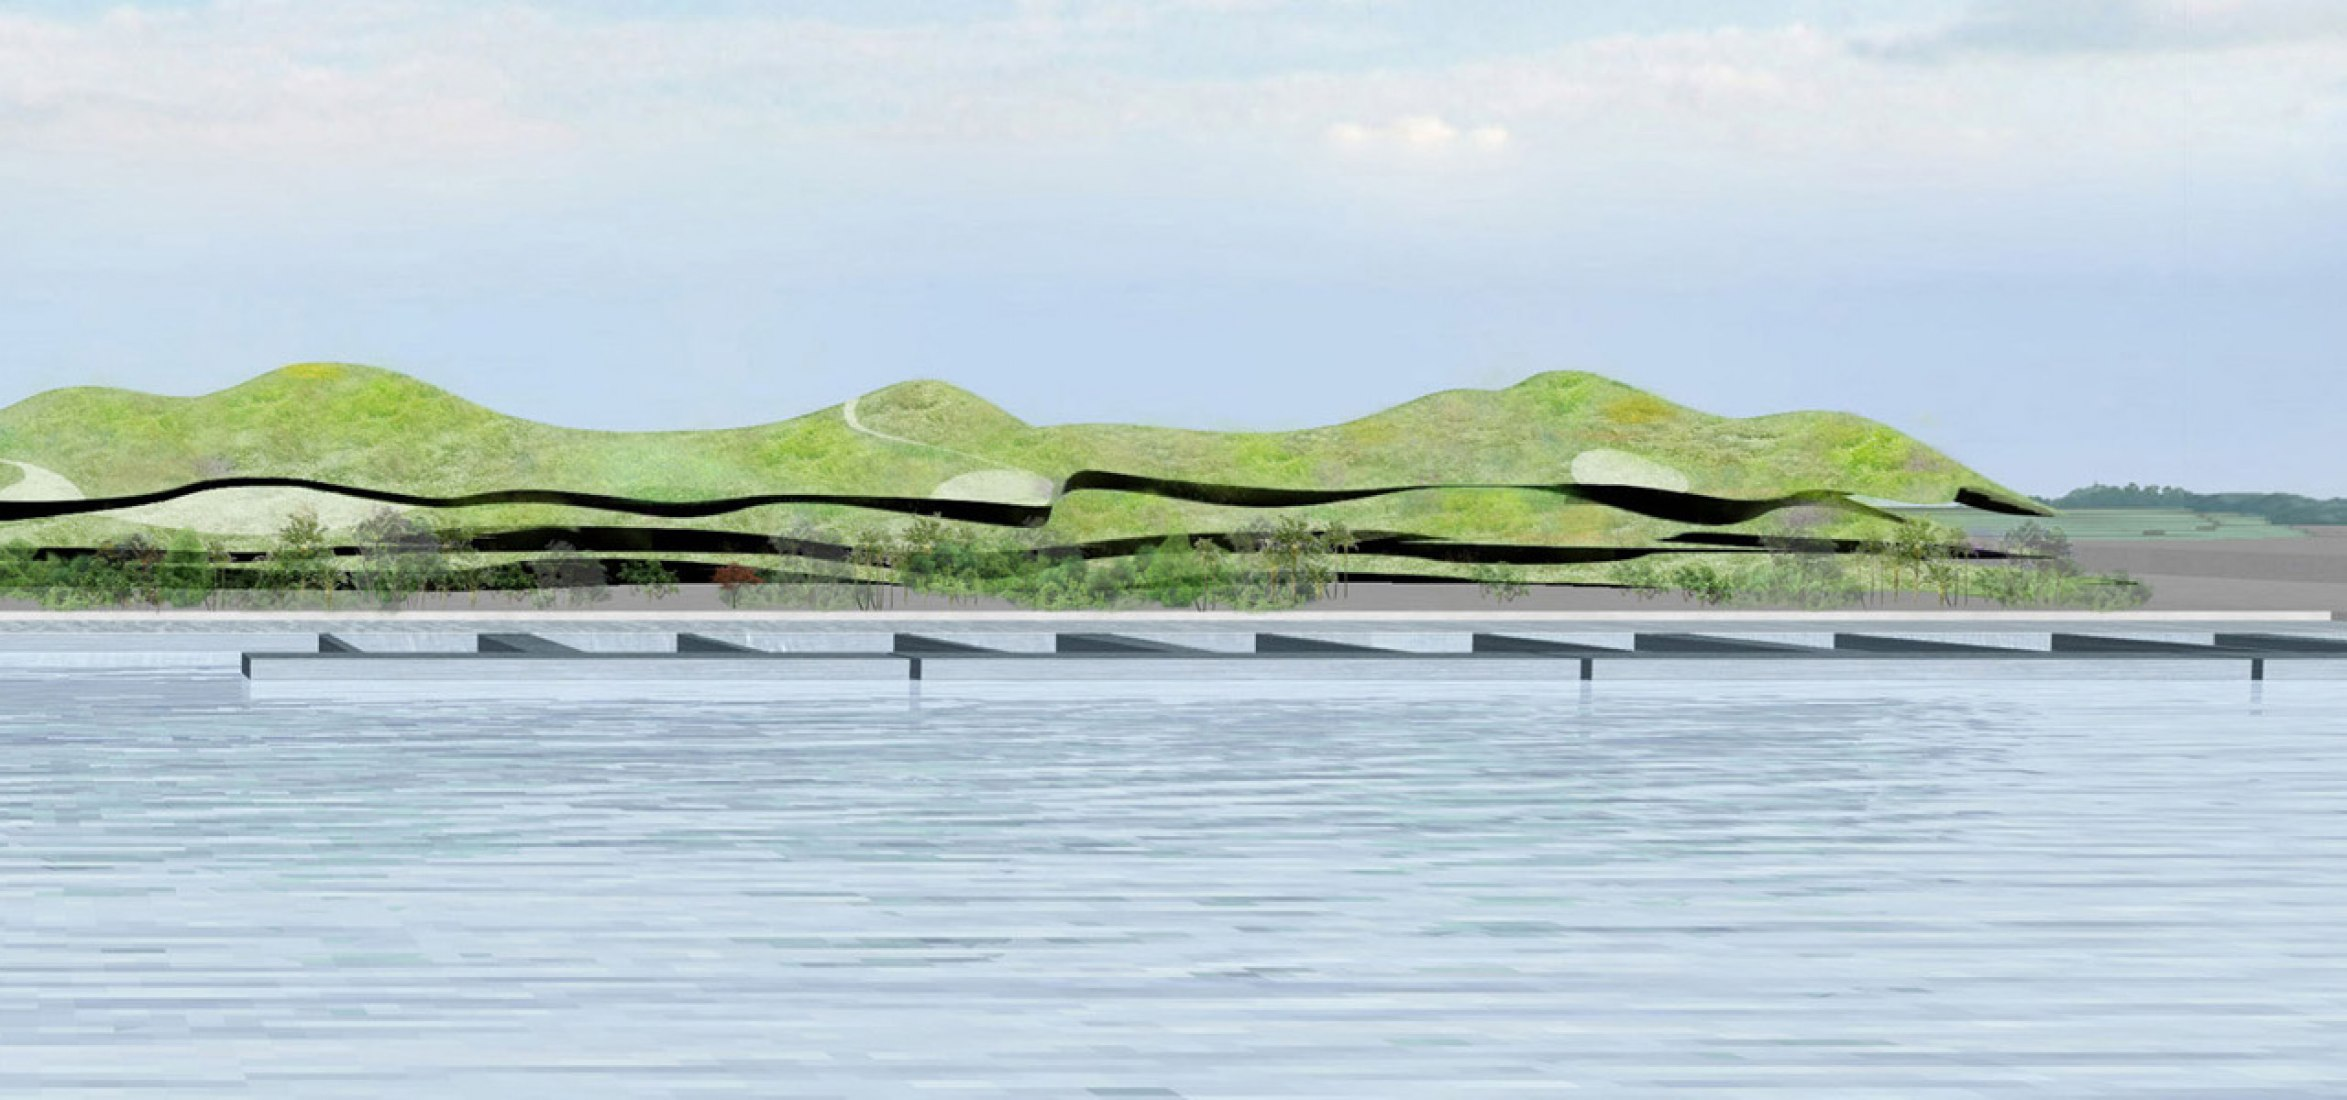 WINNER. Artificial landscape desing by Junya Ishigami + Associates. Image courtesy of Port of Kinmen Passenger Service Center.